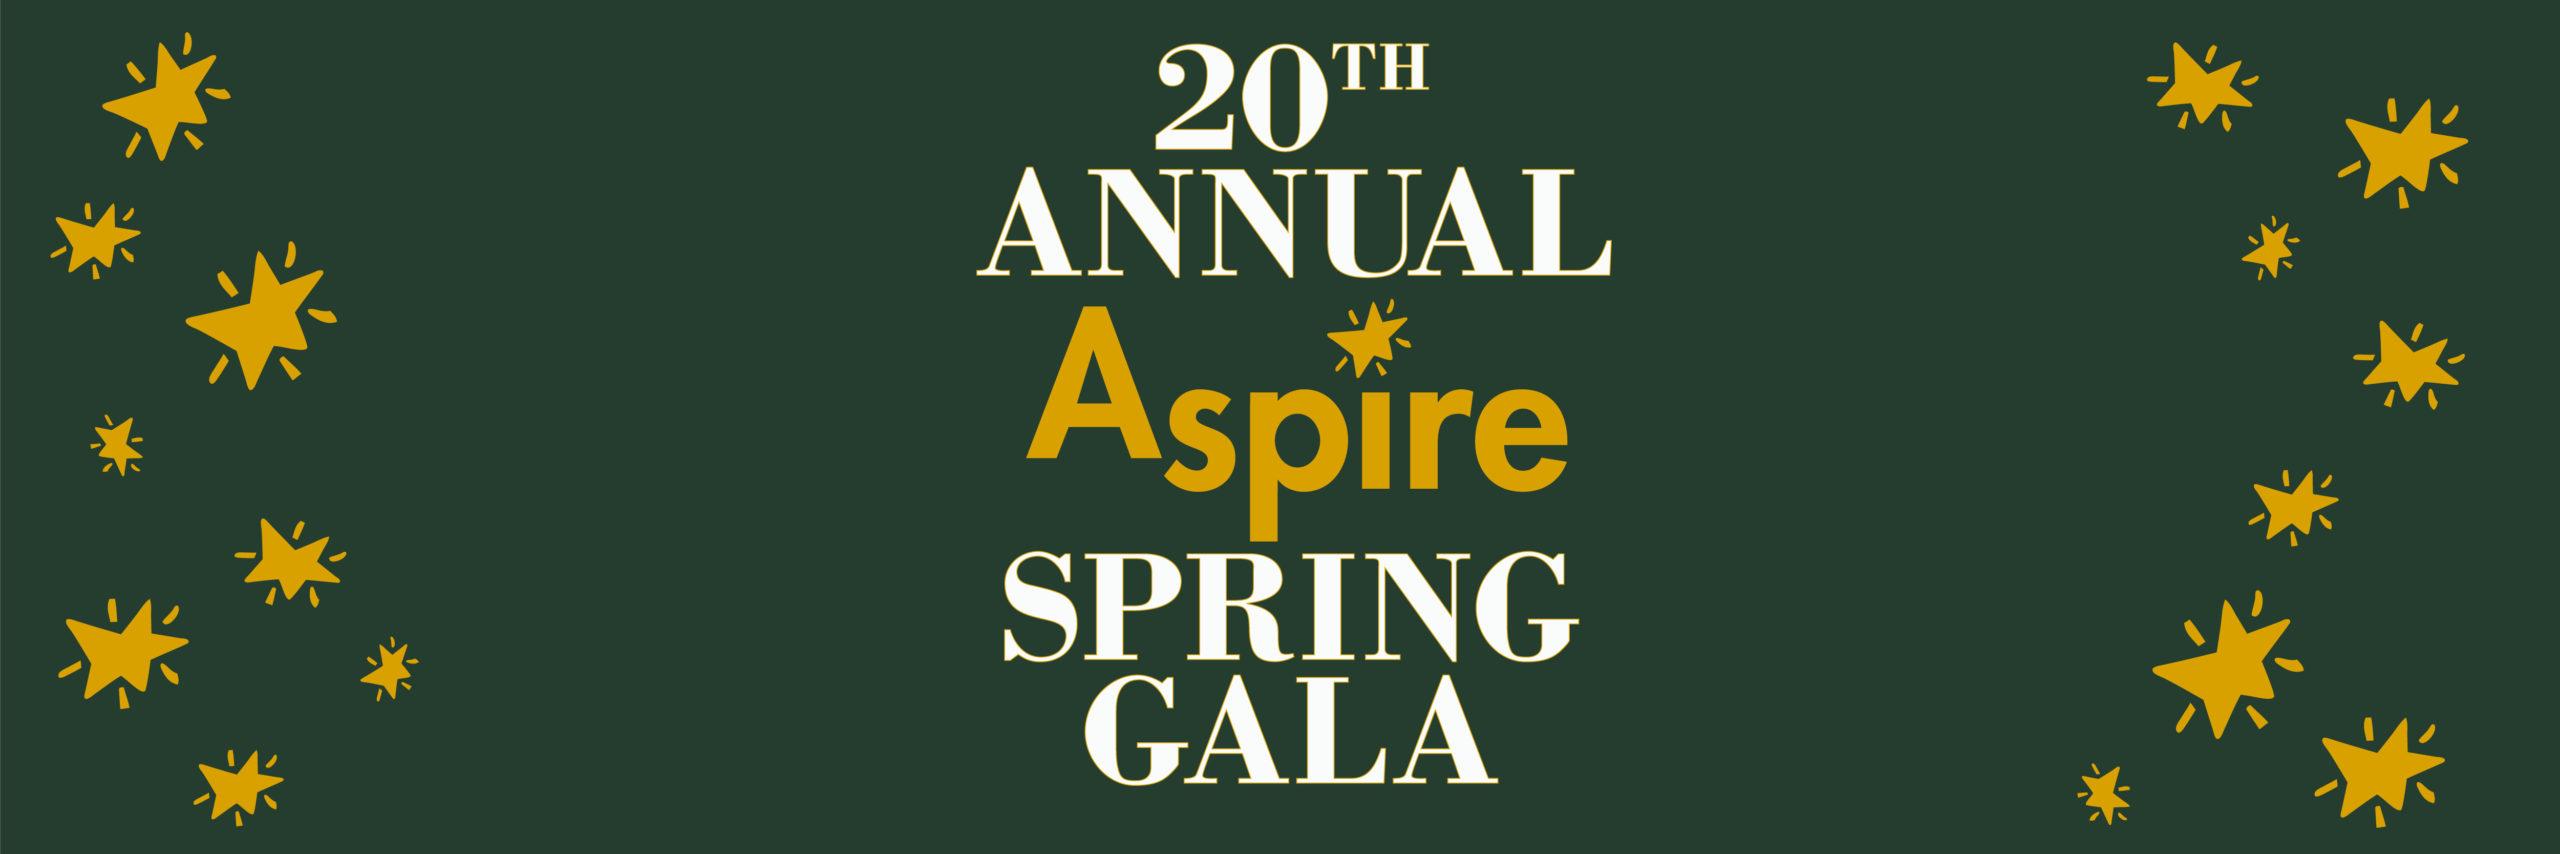 2020 Aspire Spring Gala